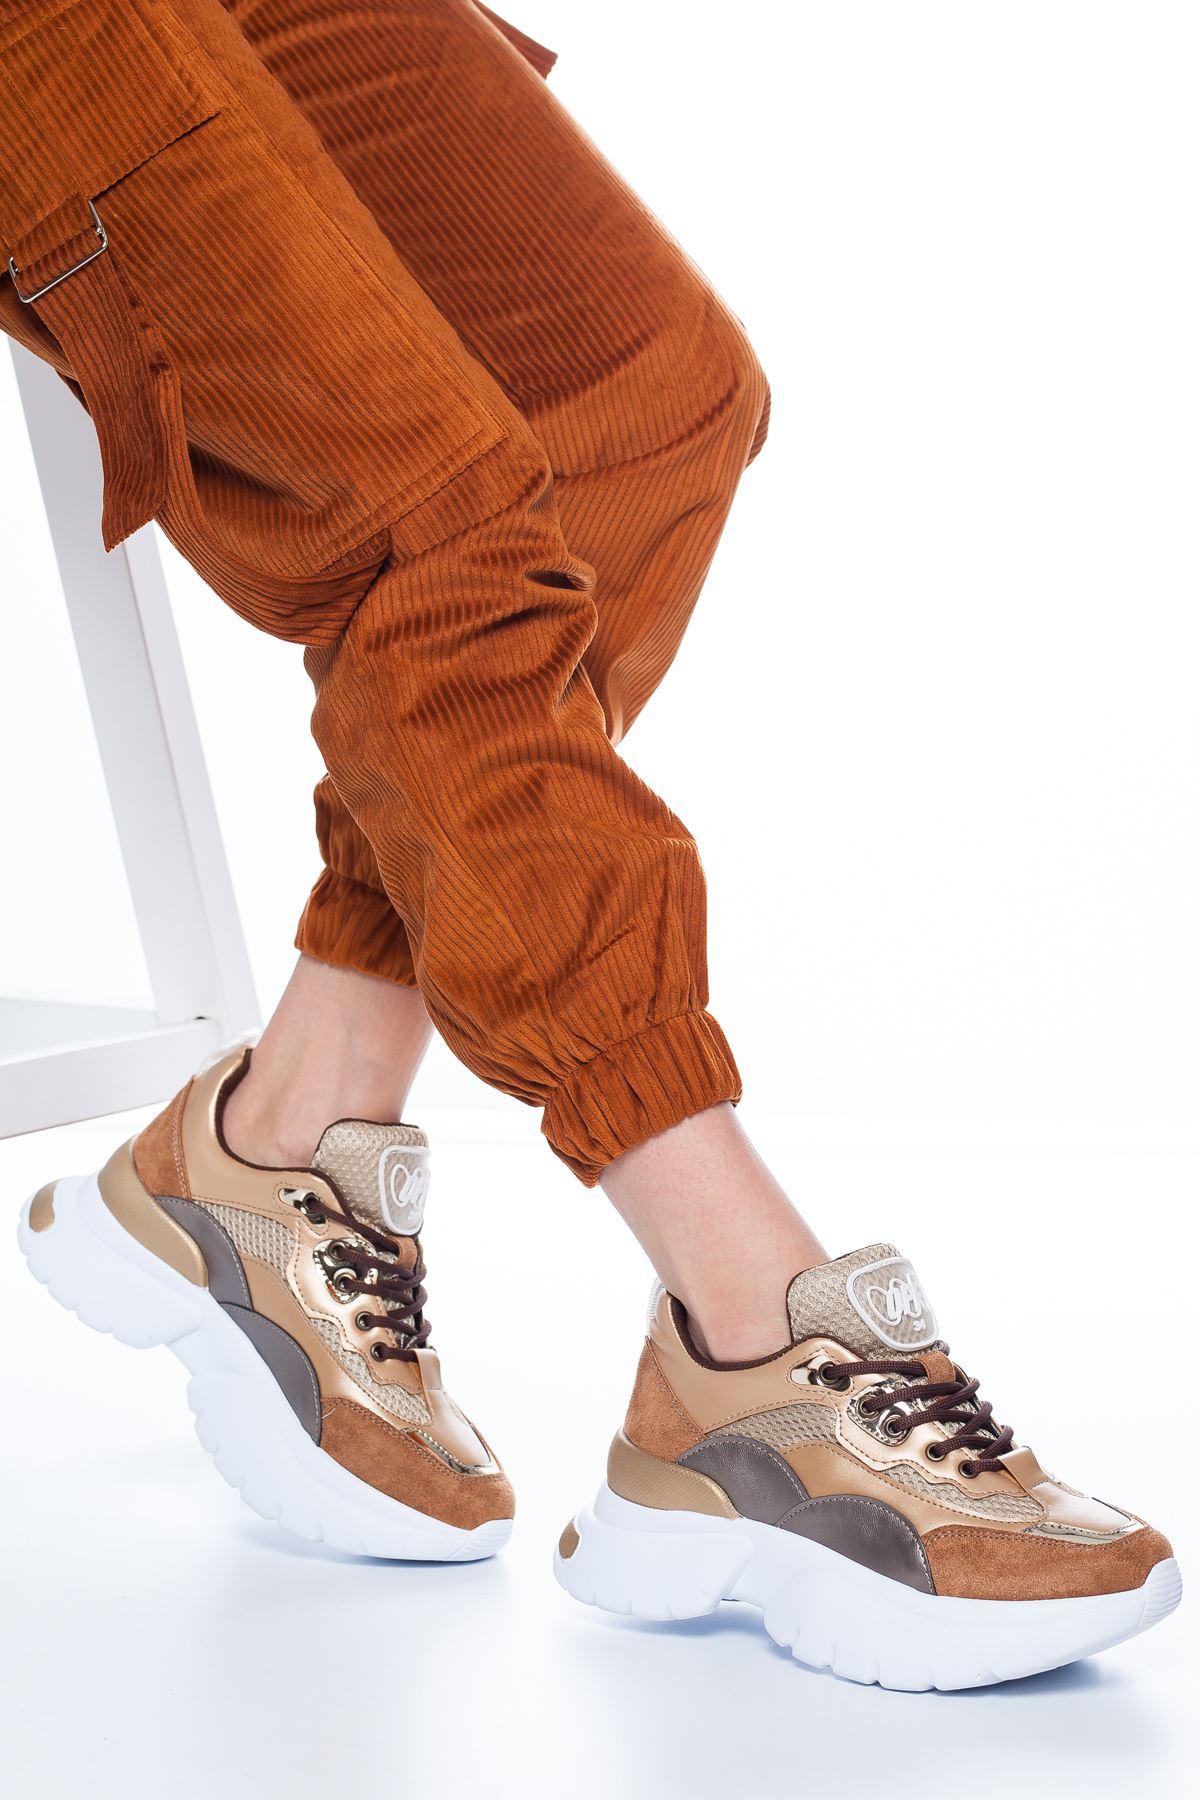 Tandor File Detaylı Sneakers Taba